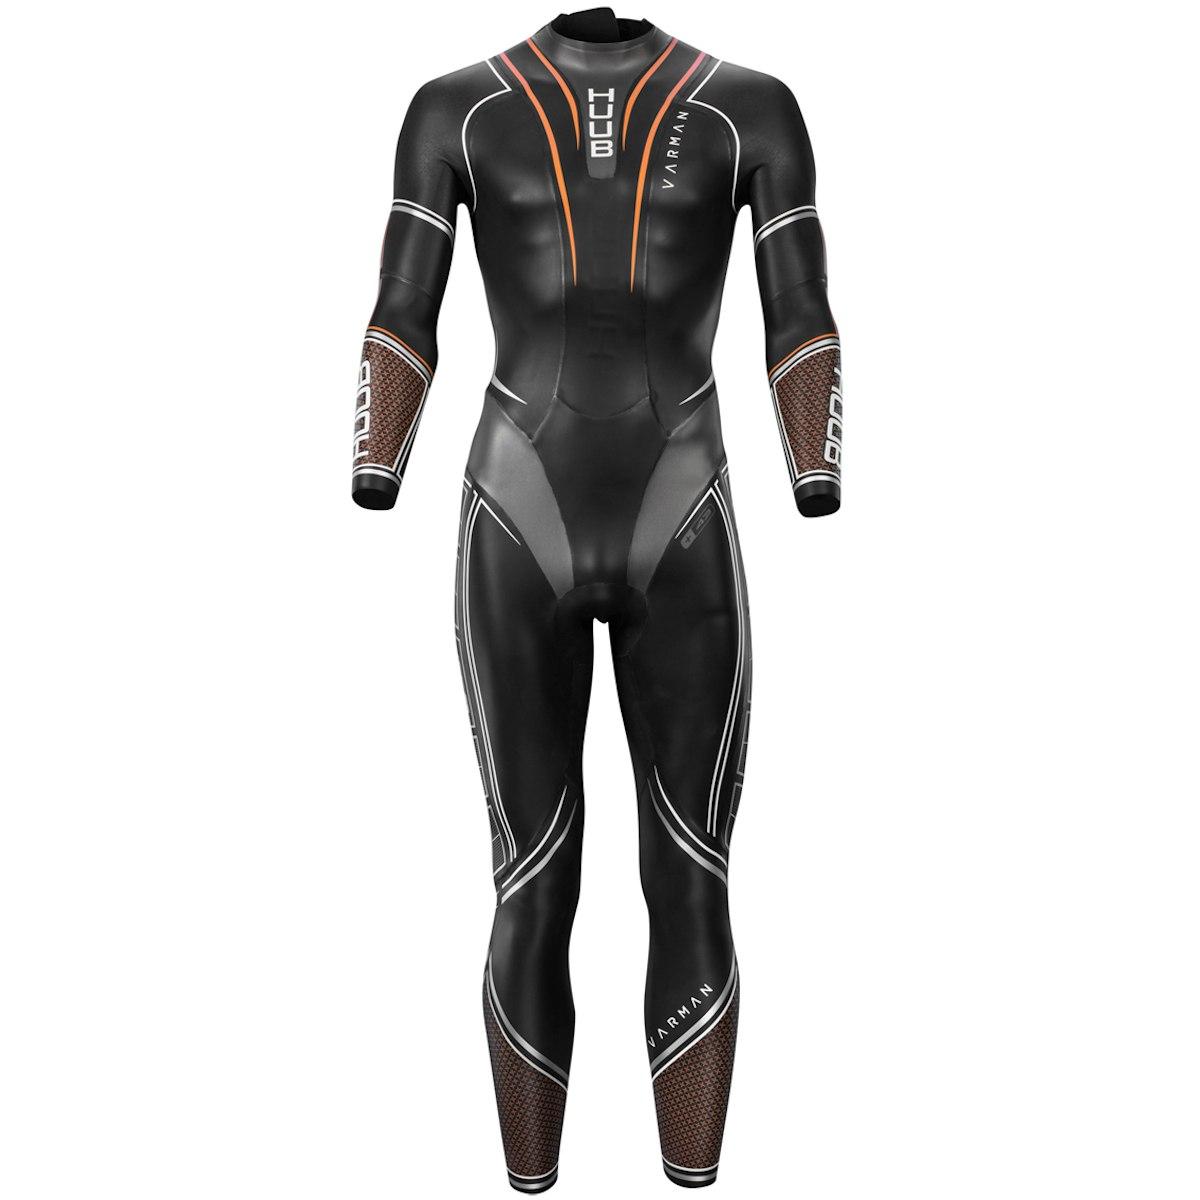 HUUB Design Varman 3:5 Triathlon Wetsuit Neoprenanzug - schwarz/orange